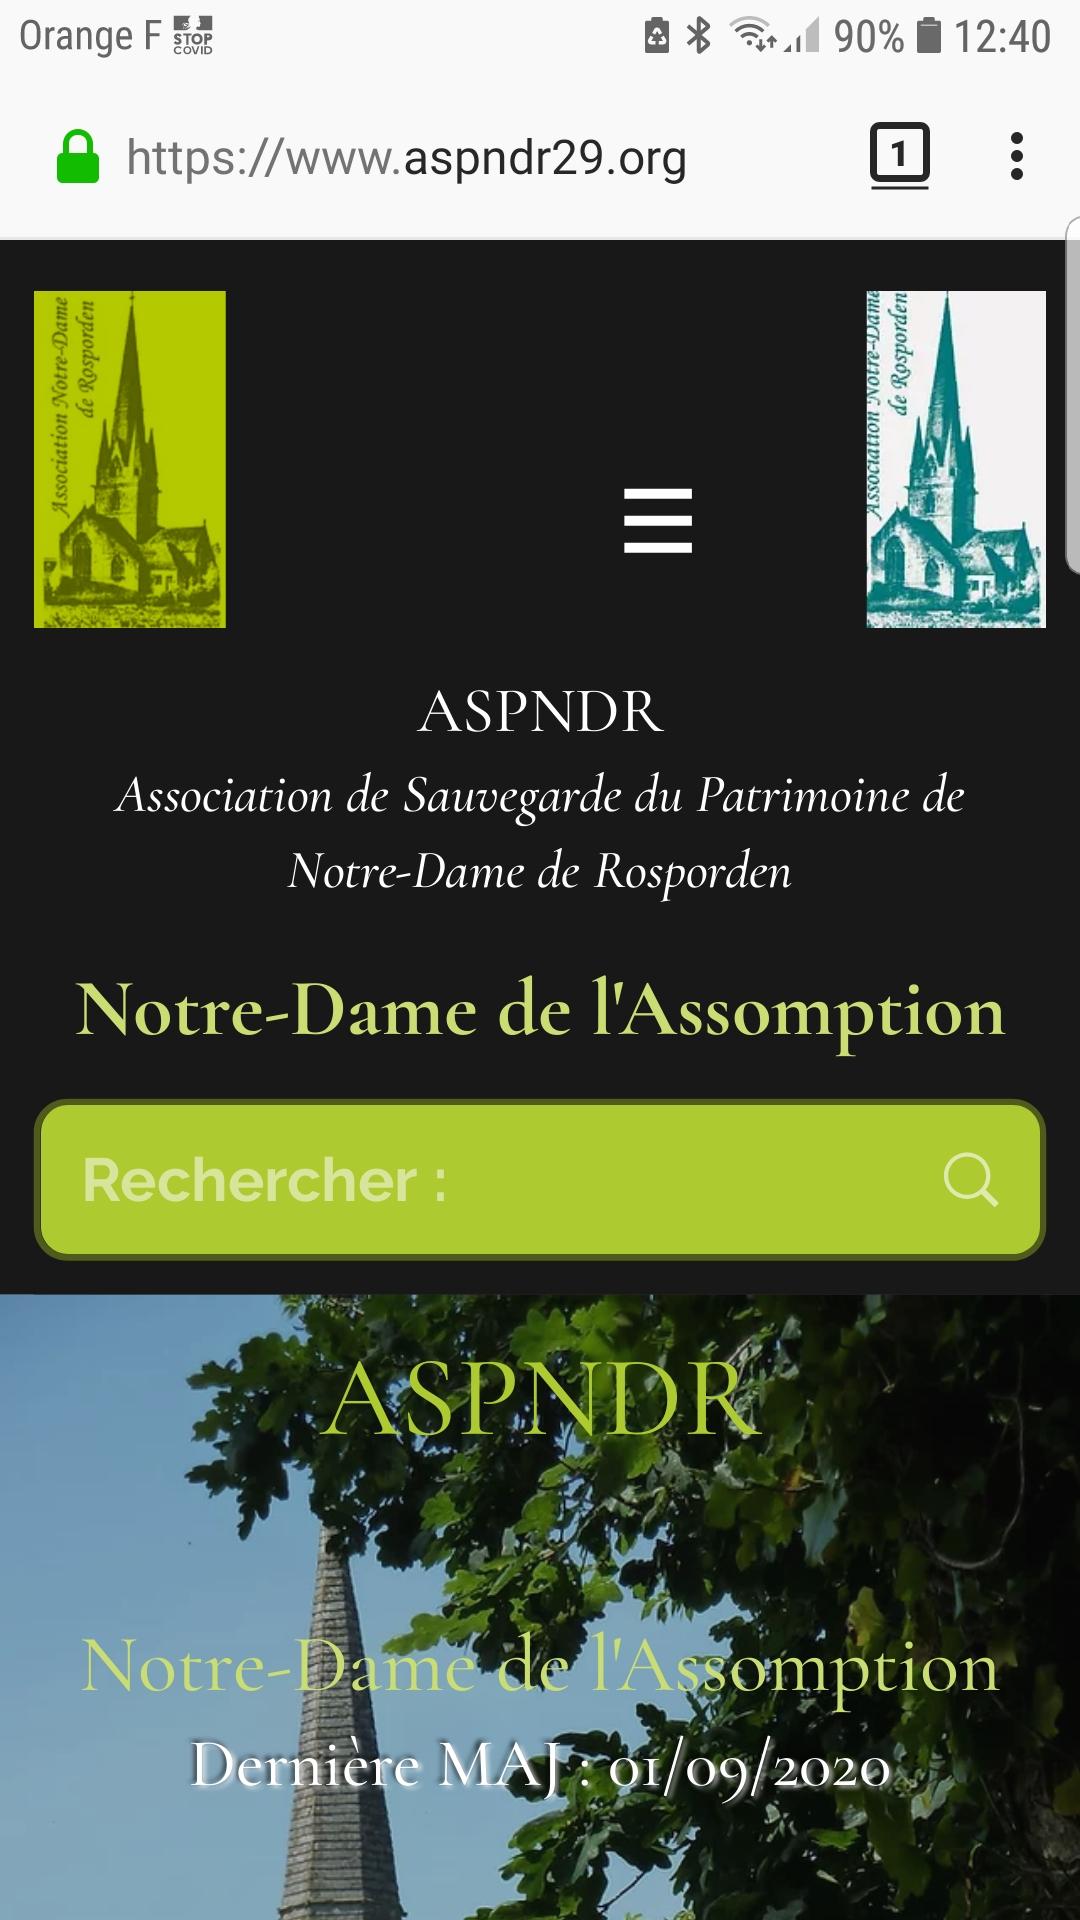 ASPNDR Accueil